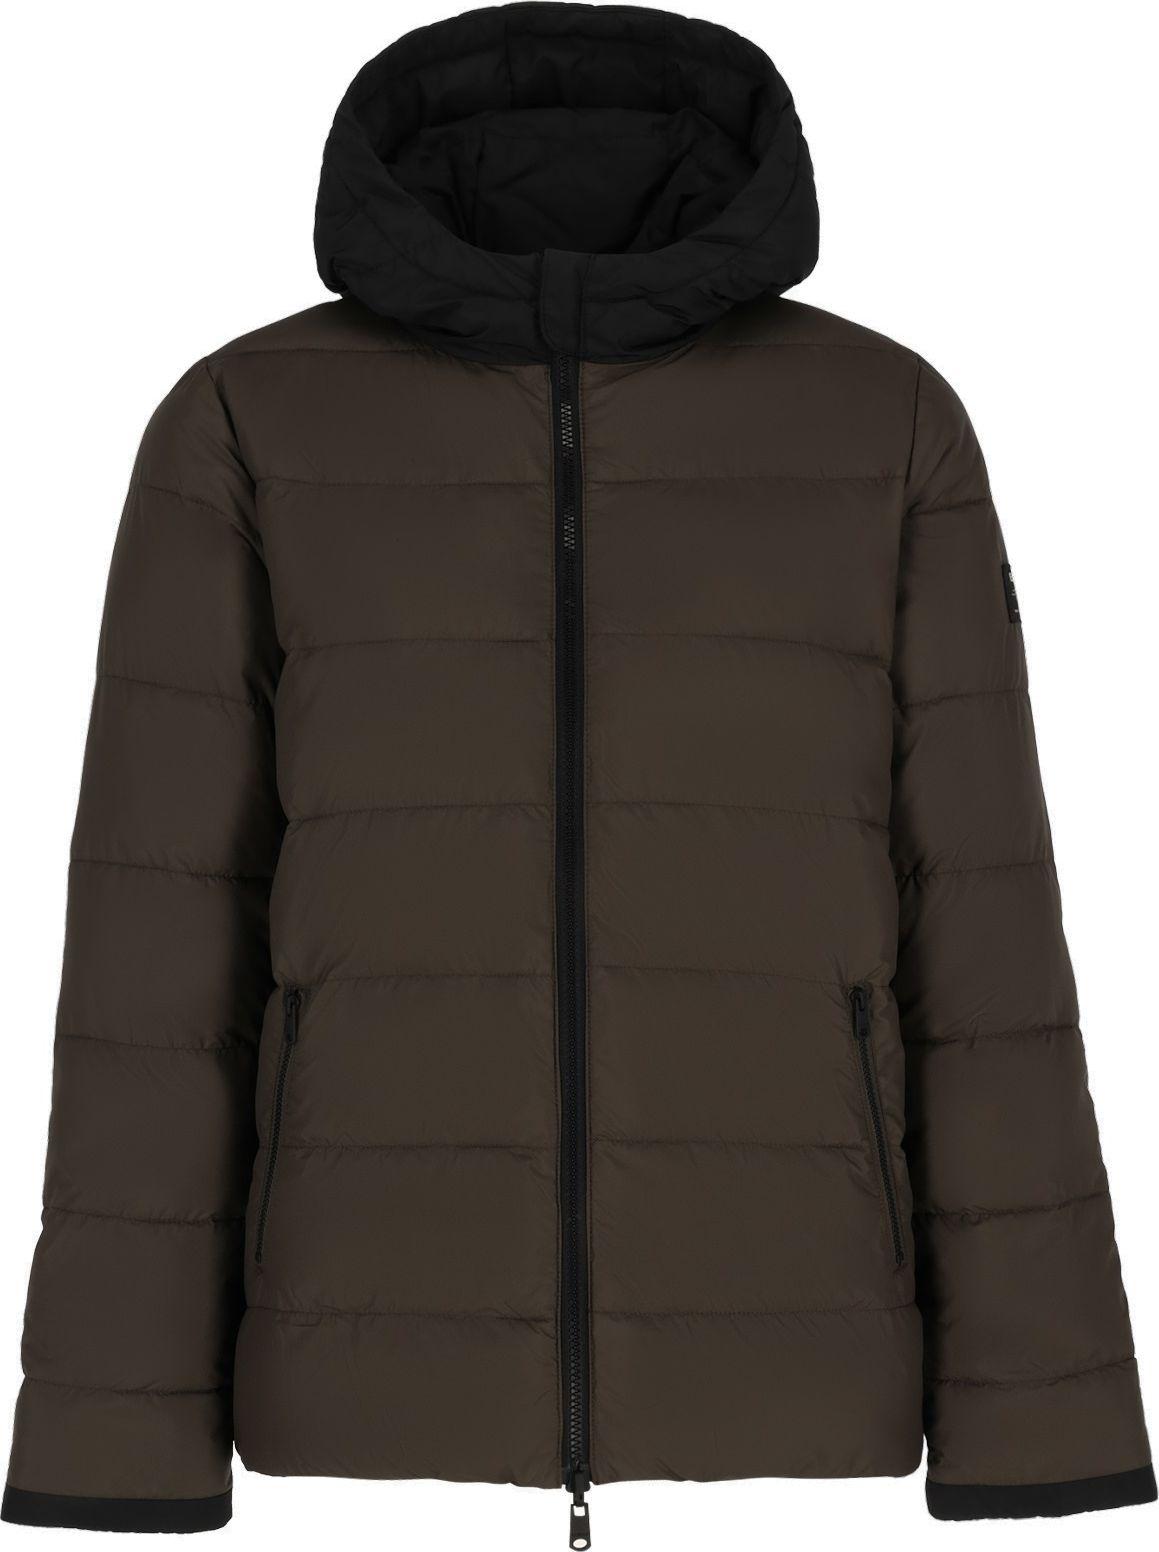 ECOALF New Crosetalf Jacket Women's Dark Bronze S